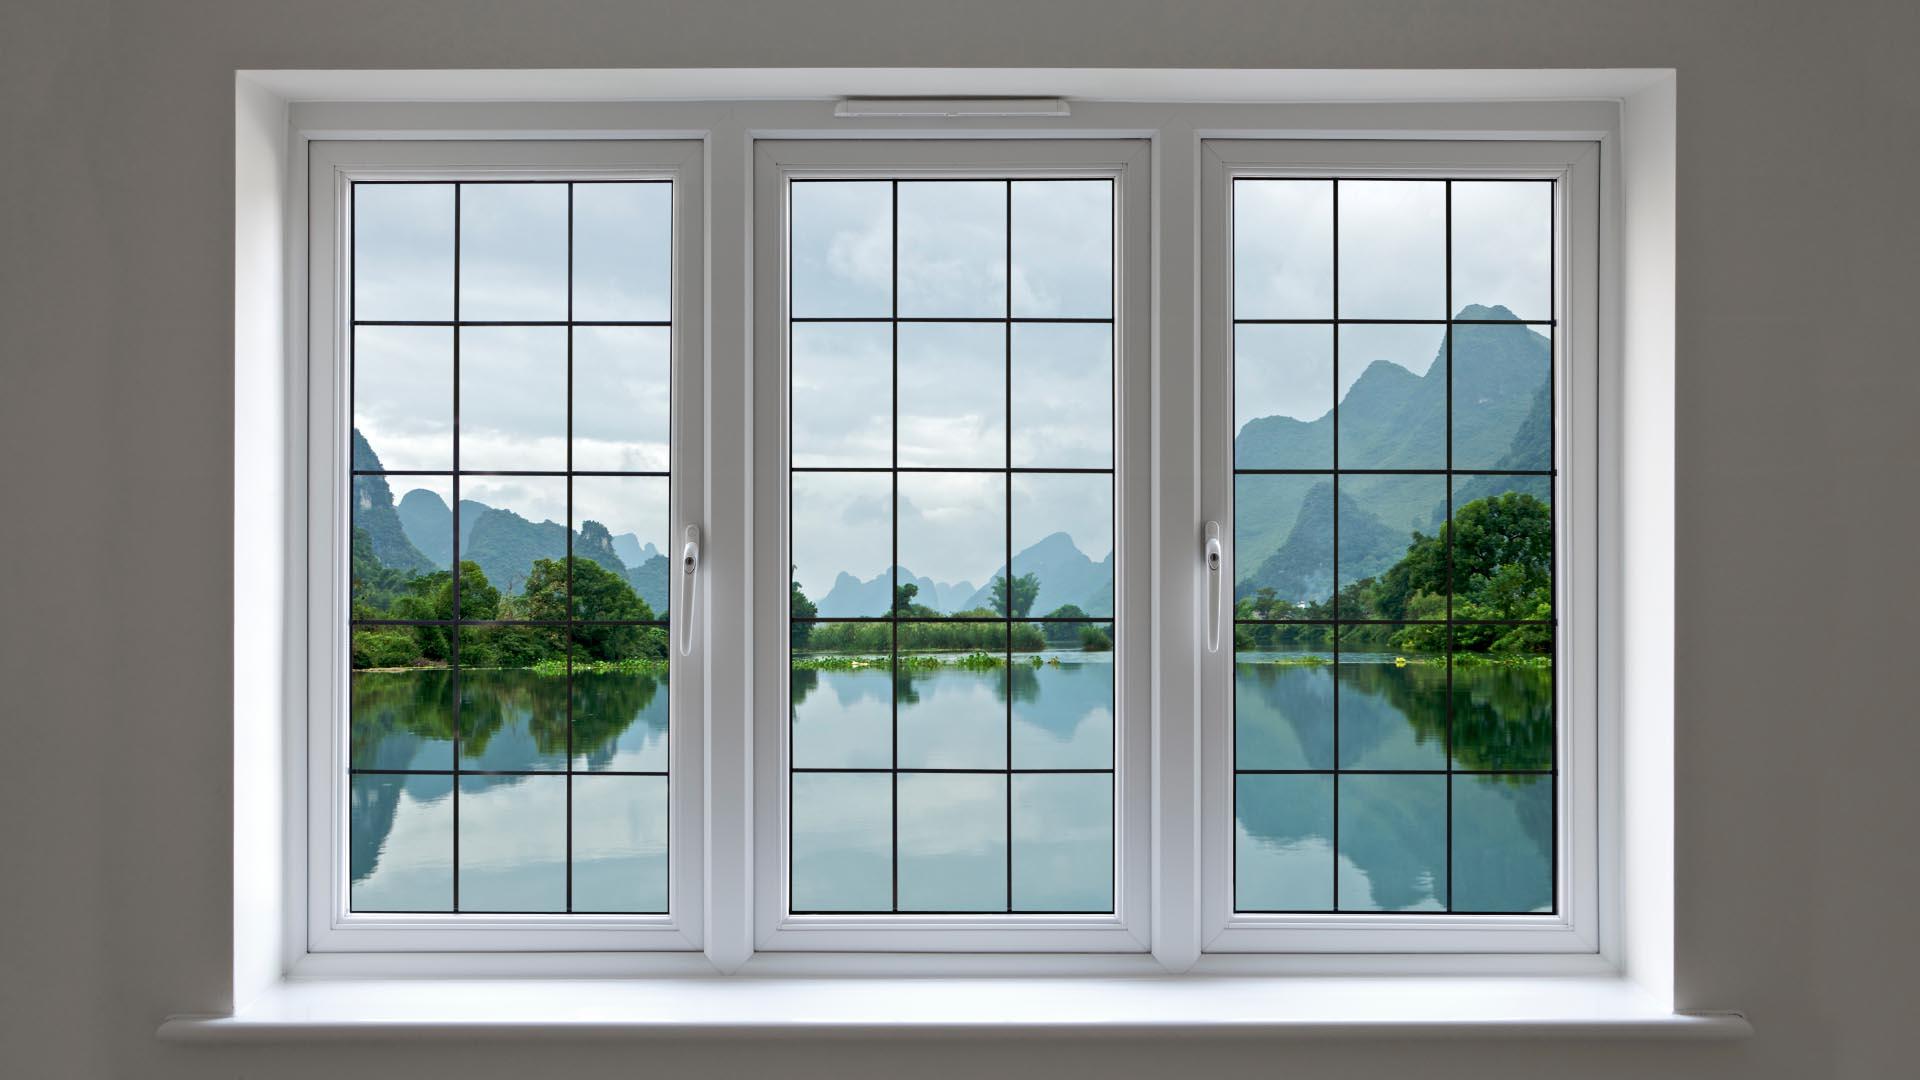 Glass Window Repair – Re-Establish Your Home's Security